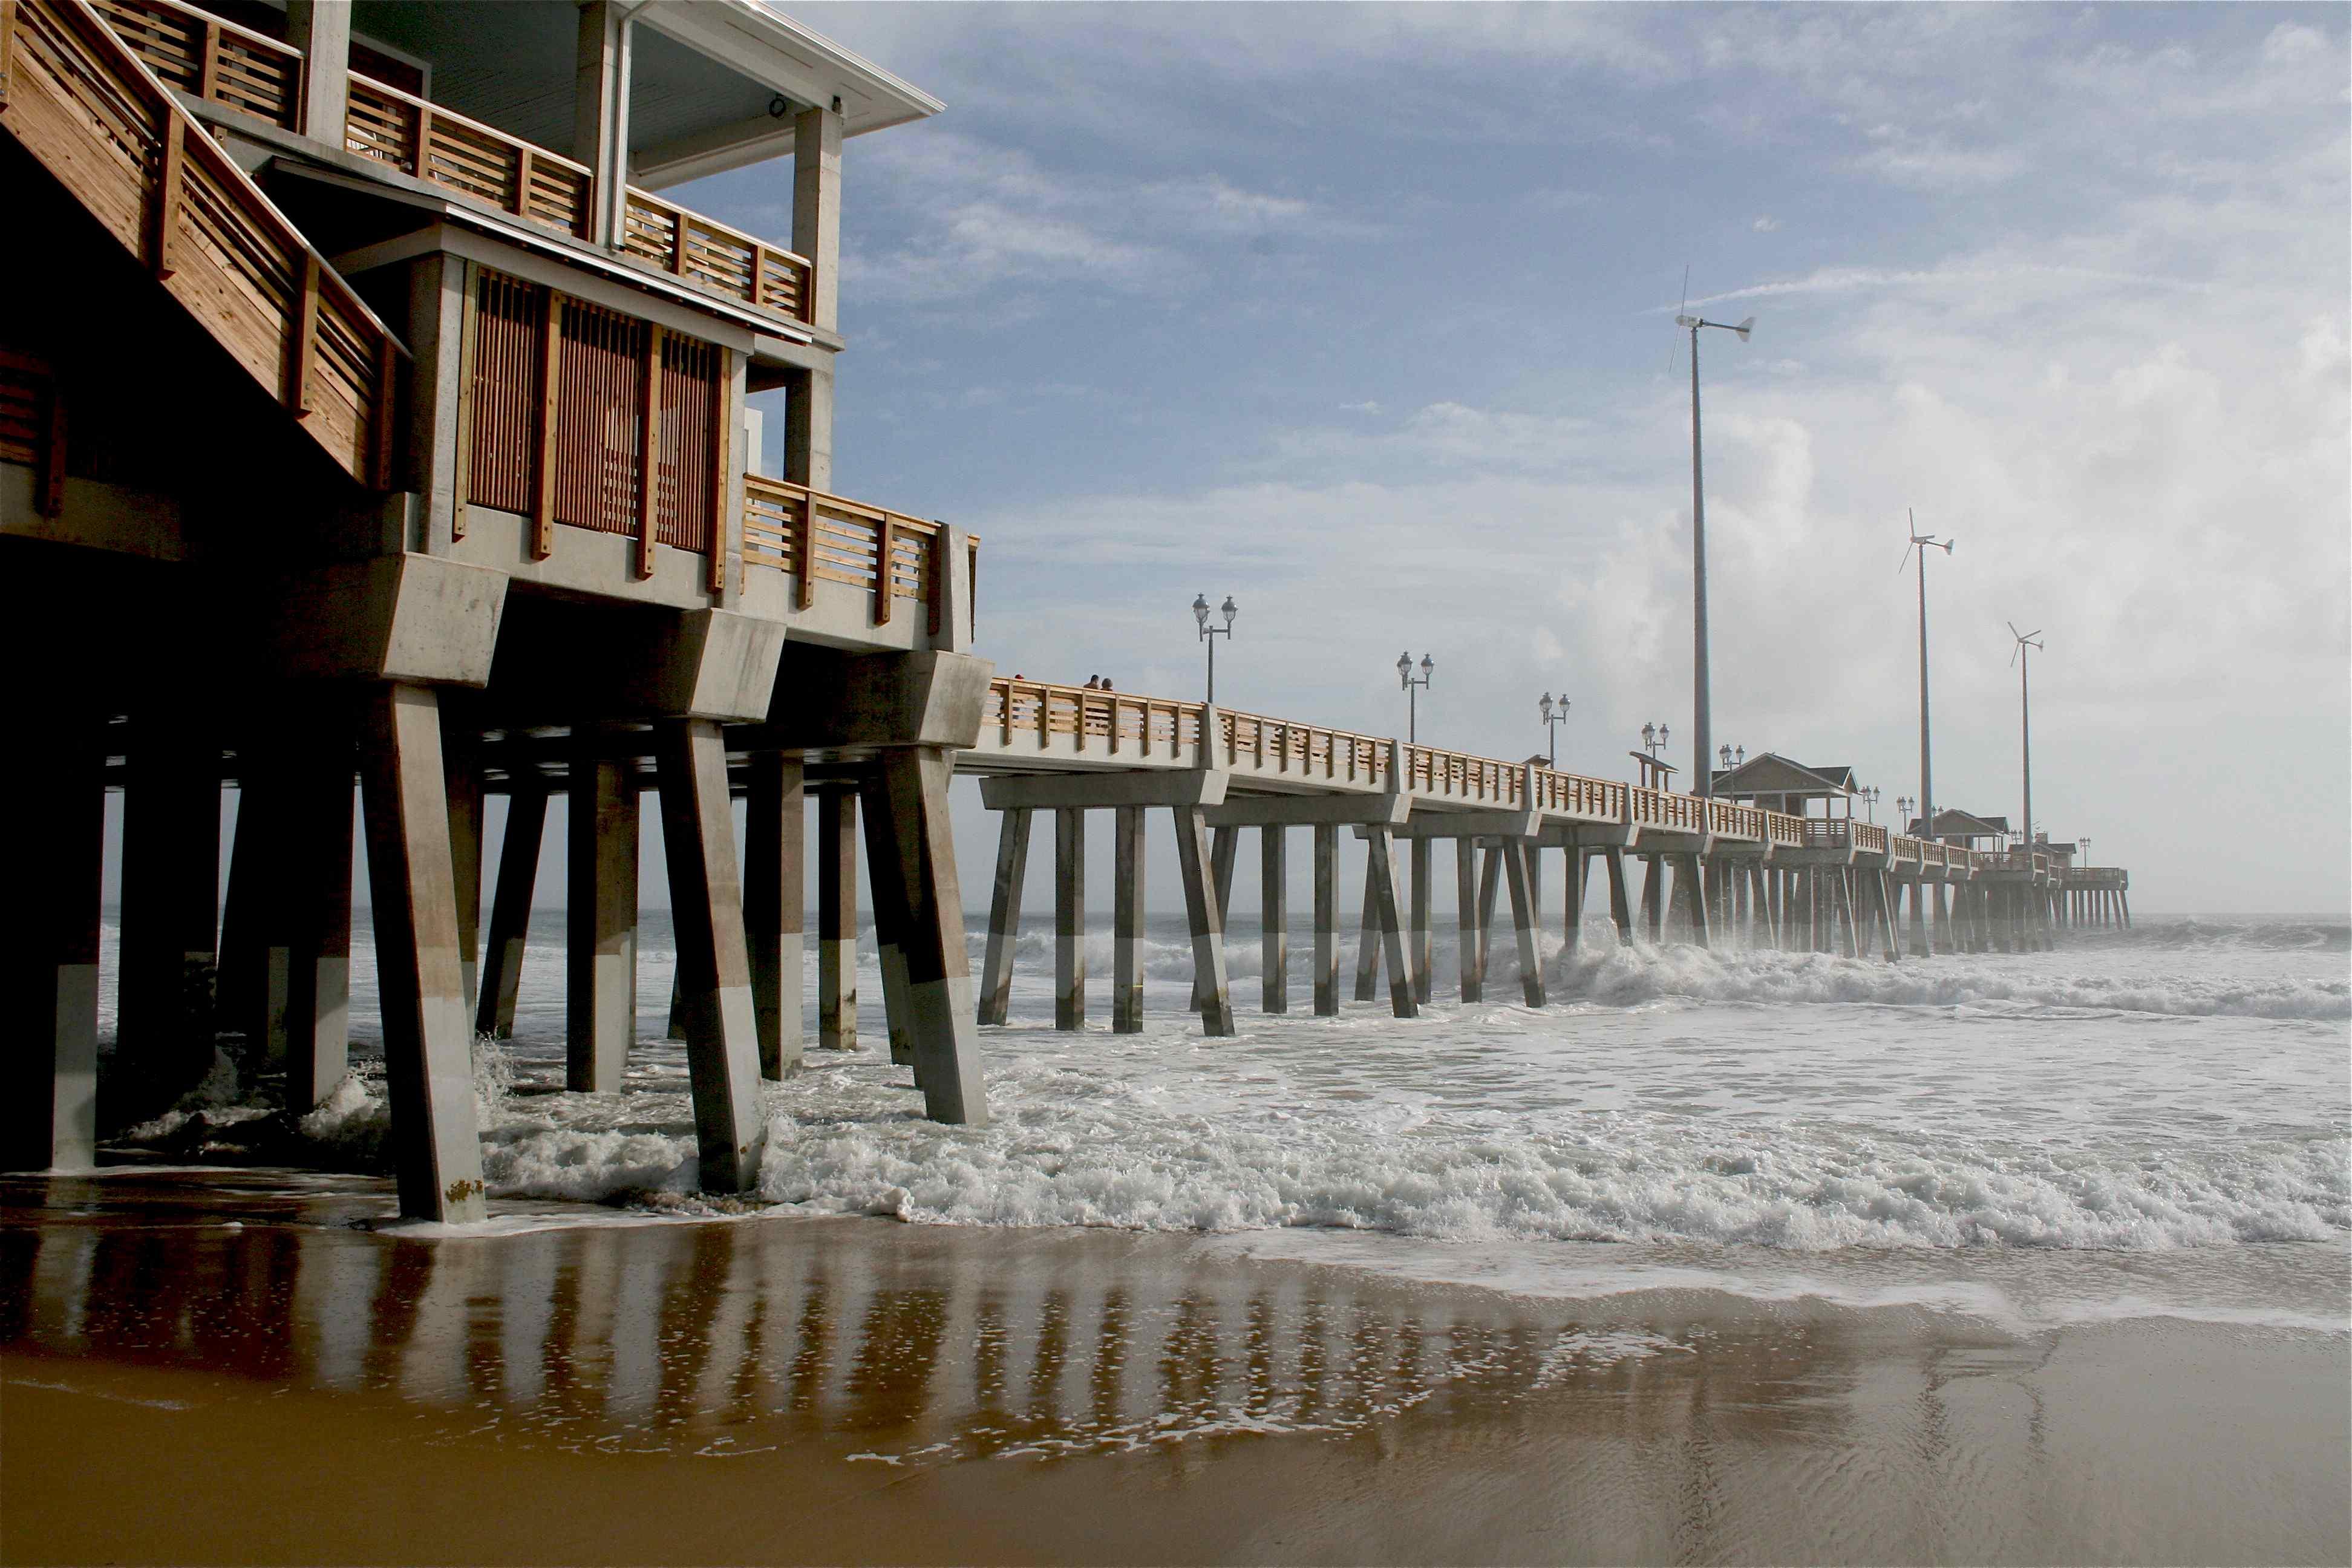 Pier pzazz albert vick for Jennette s fishing pier